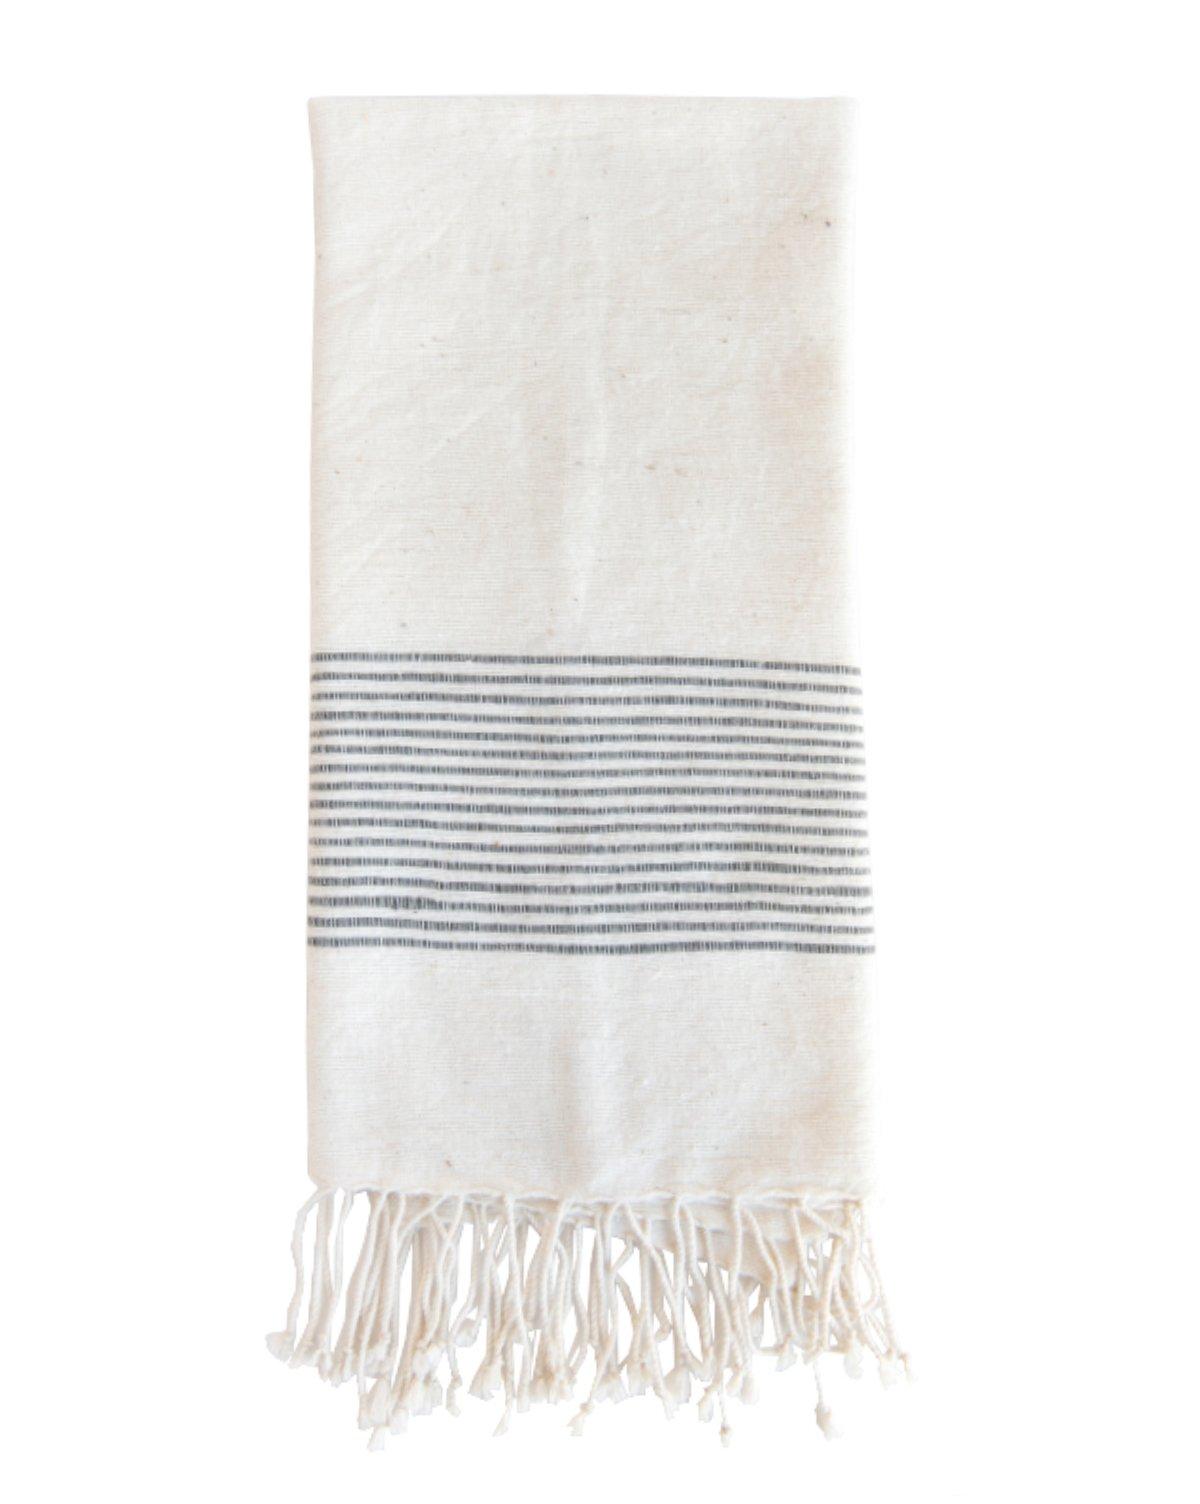 Walcott_Hand_Towel_1_206f151d-c979-4769-a281-0bc5b2647d8a (1).jpg